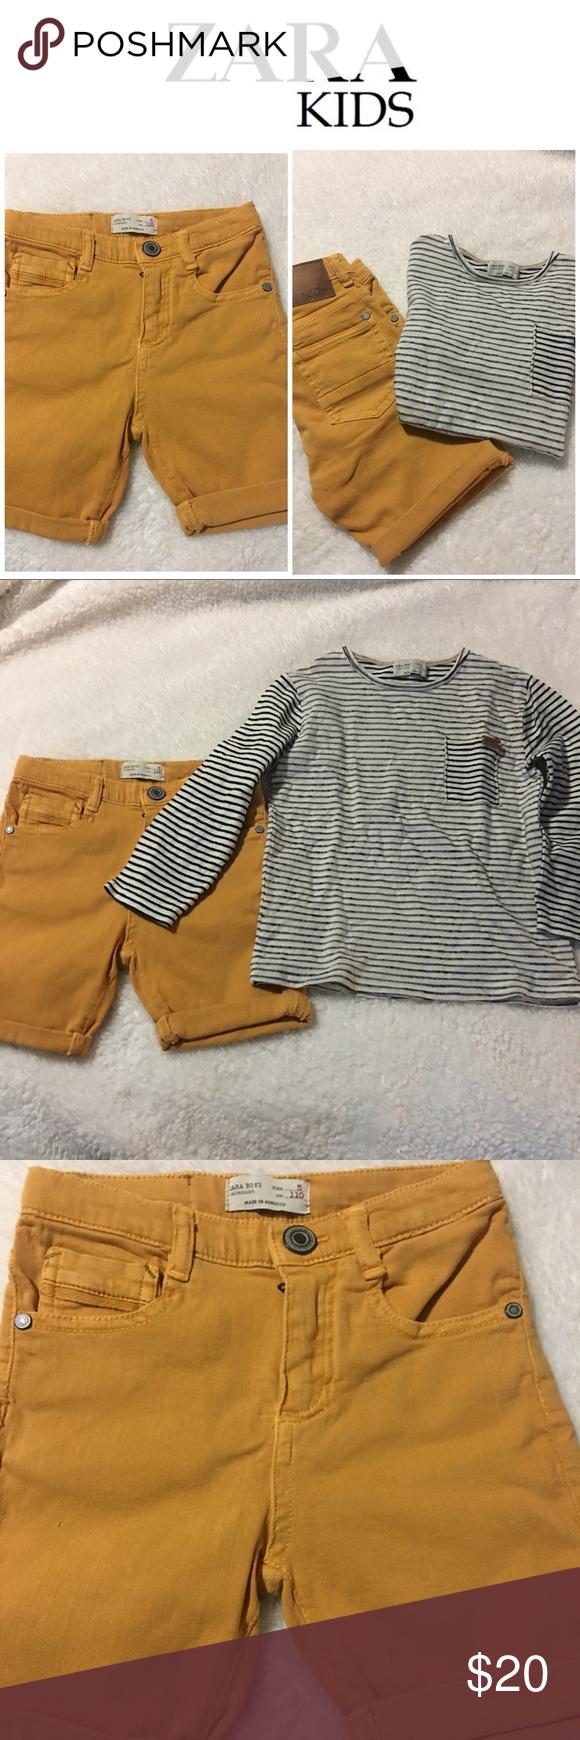 ZARA BOYS SHORTS | Zara boys, Boy shorts, Zara